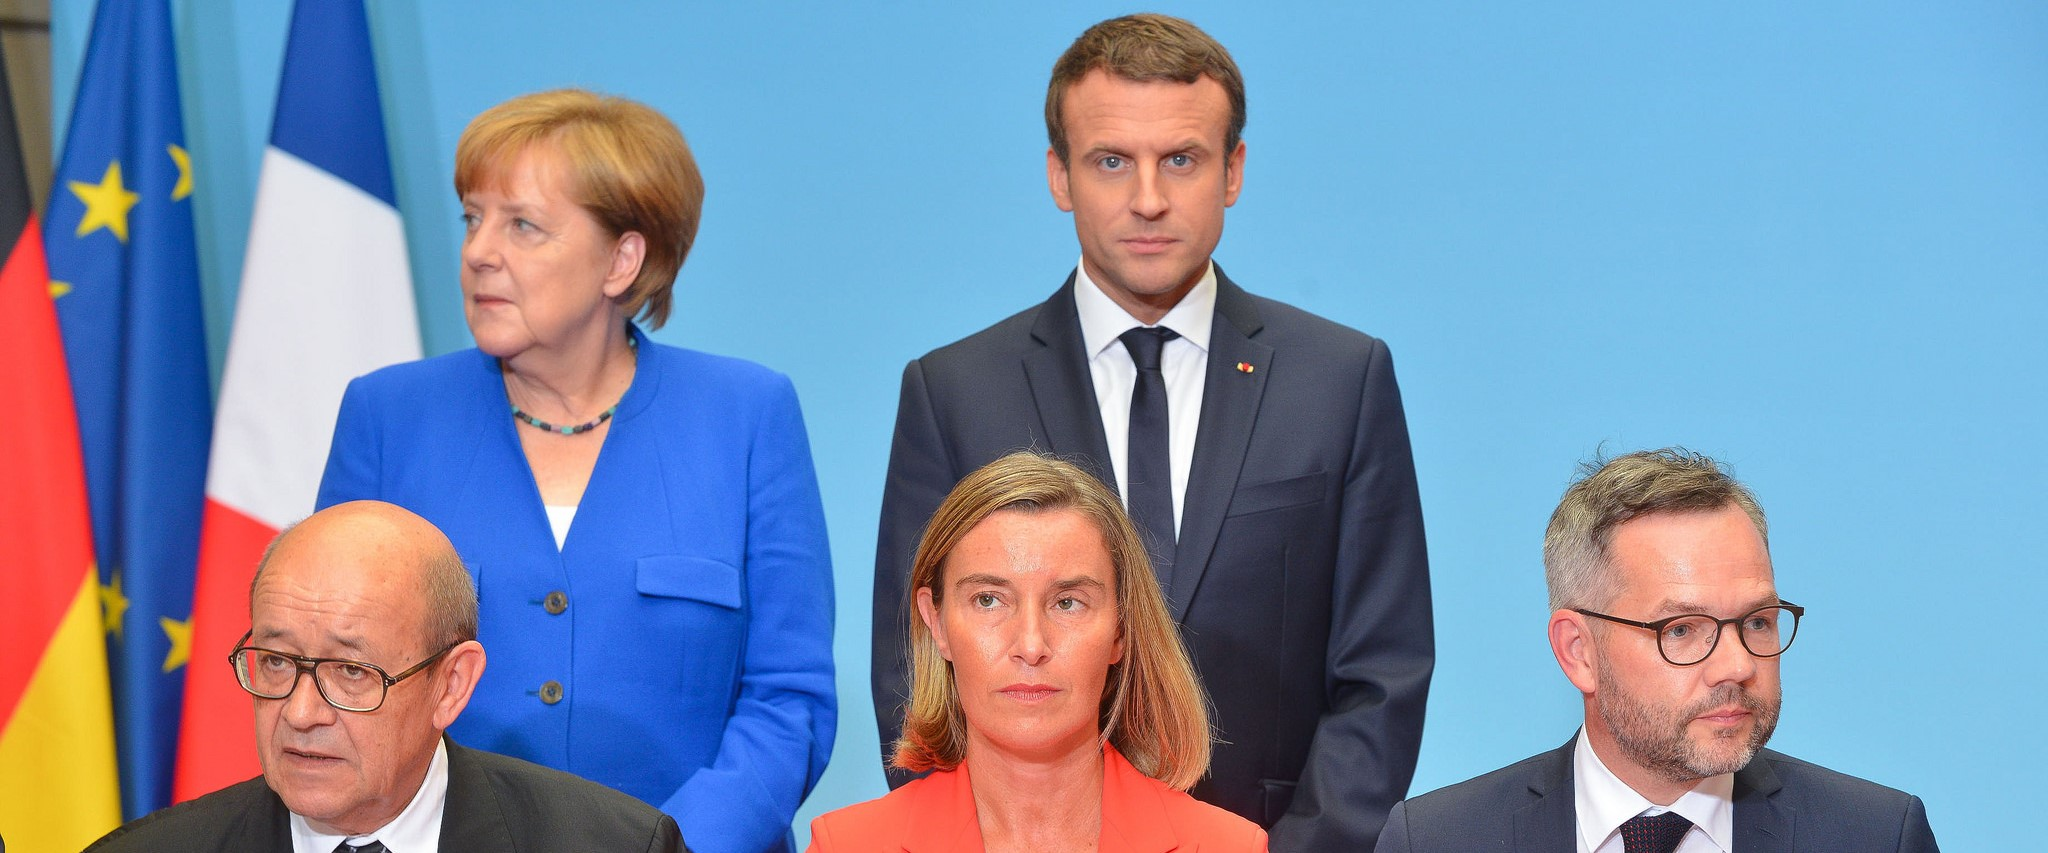 France's President Emmanuel Macron, July 2017 (Photo: Flickr/European External Action Service)